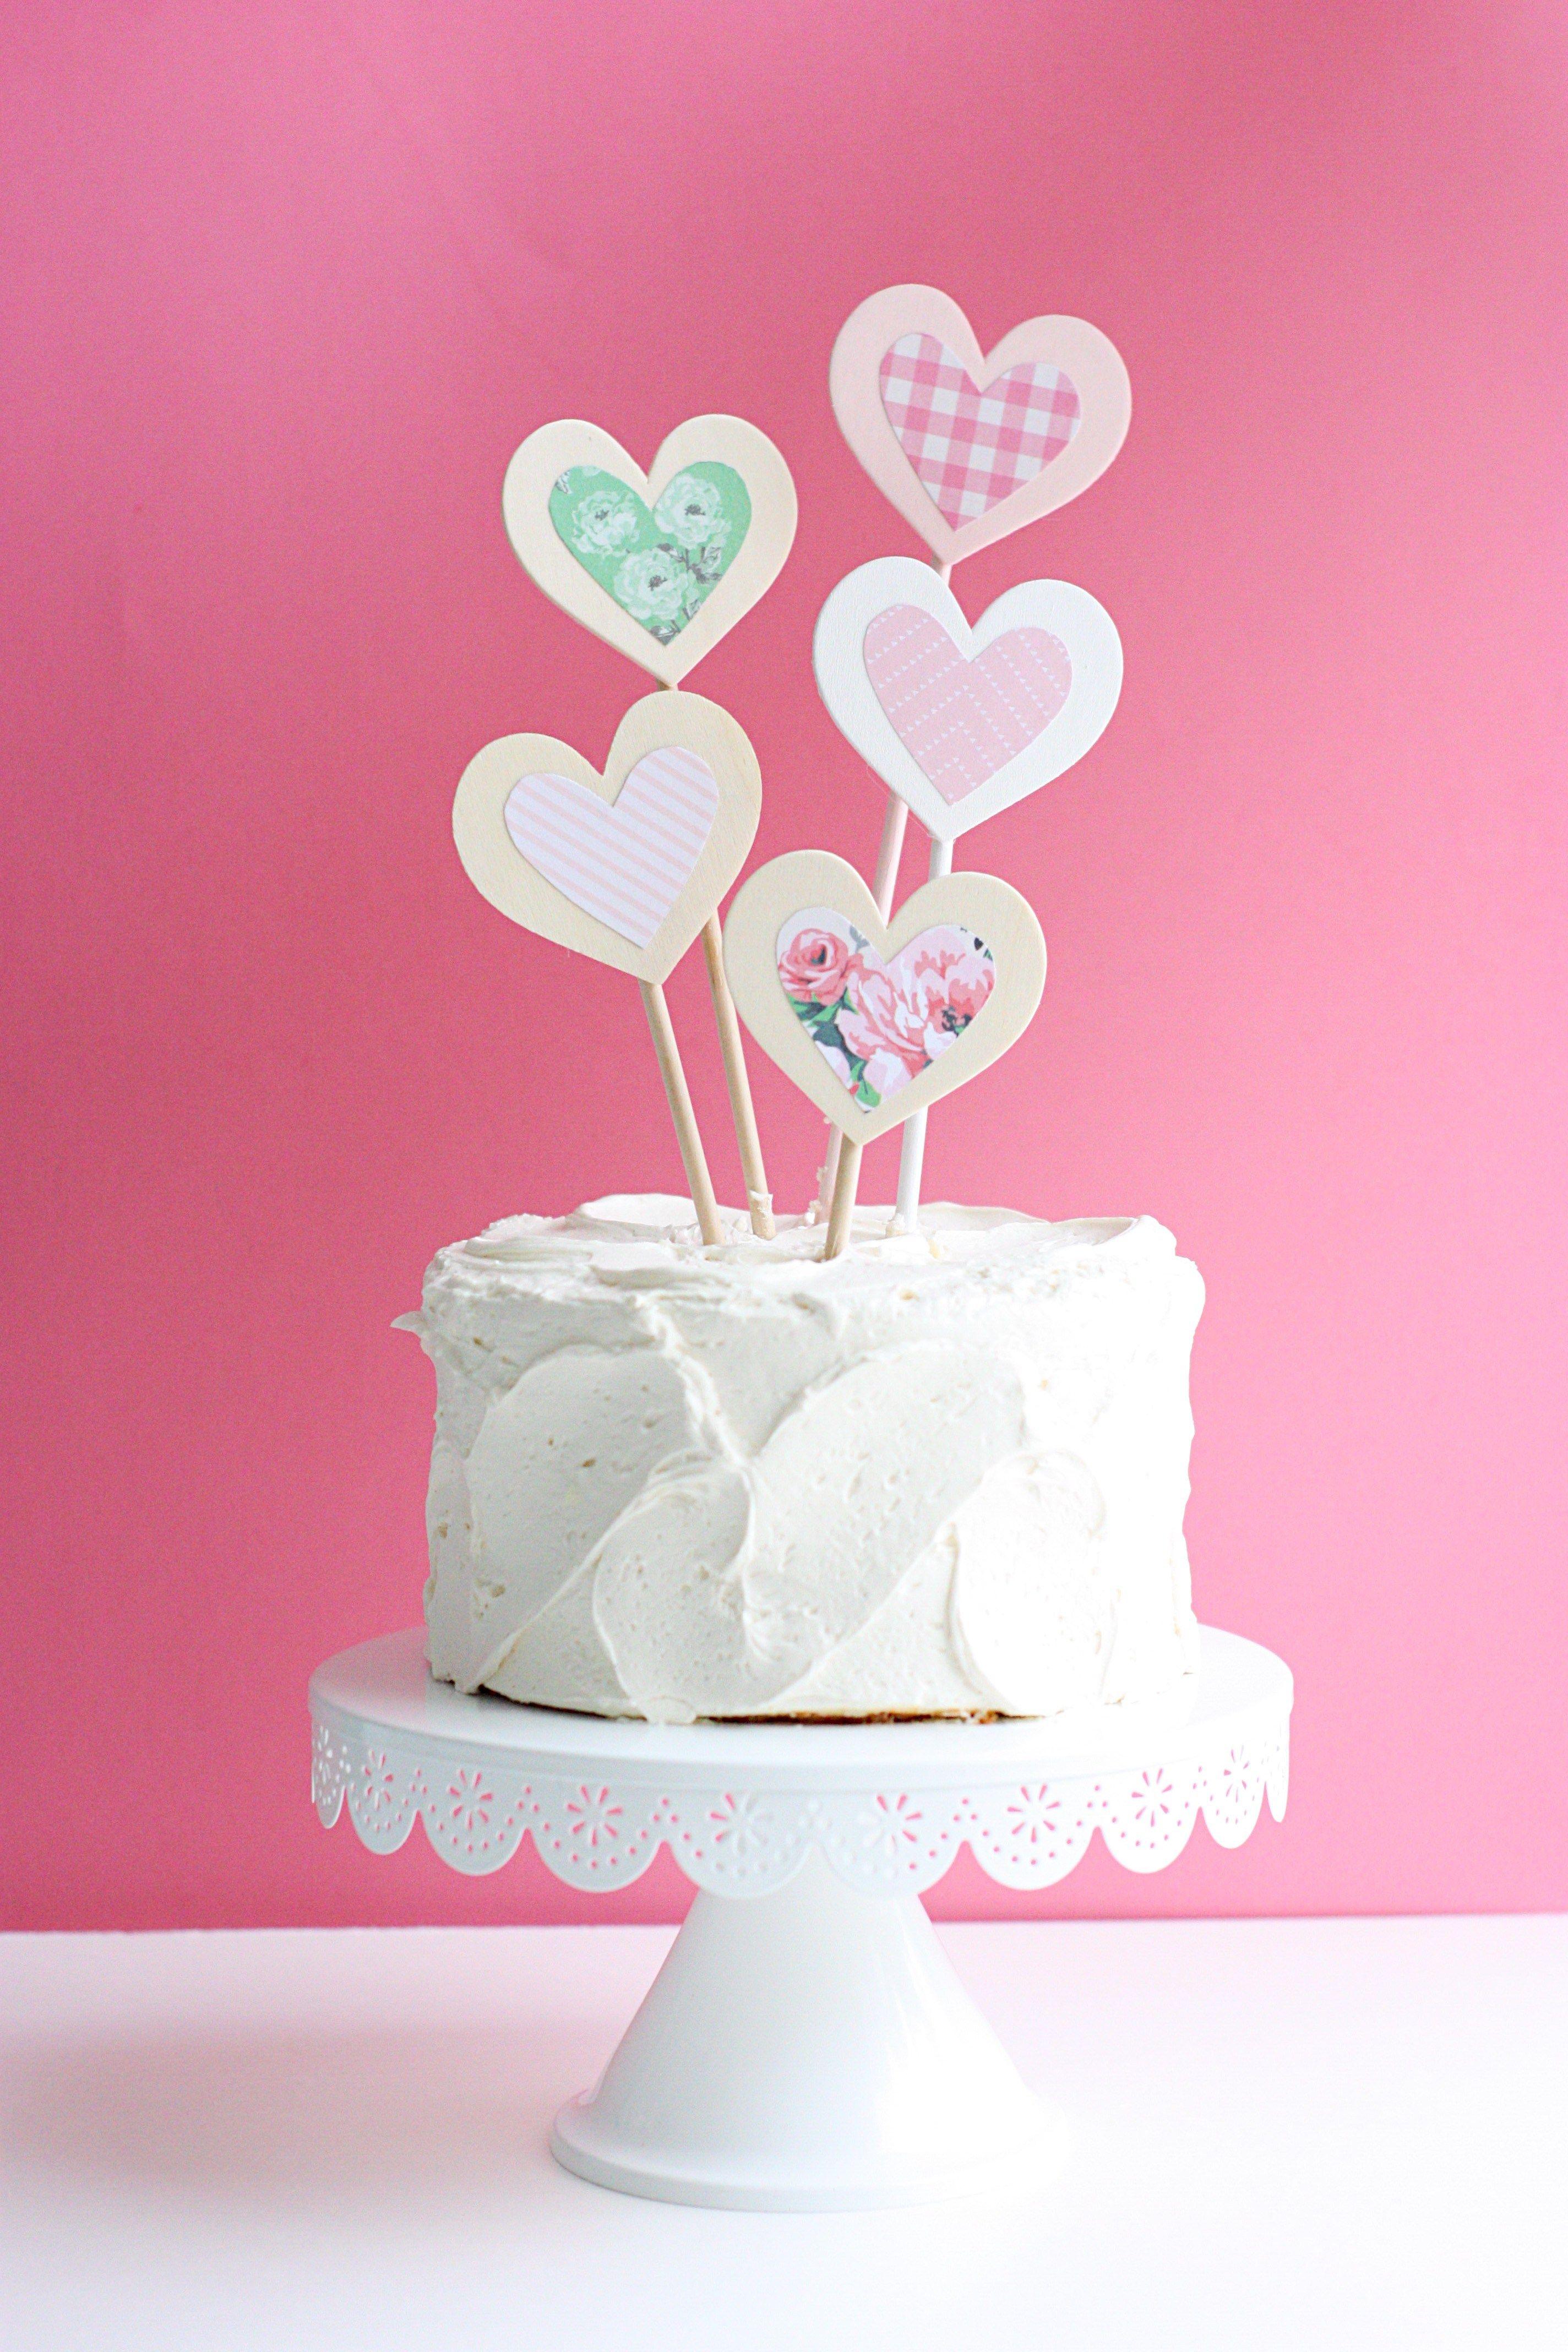 Diy Layered Heart Cake Topper Valentine S Day Ideas Pinterest